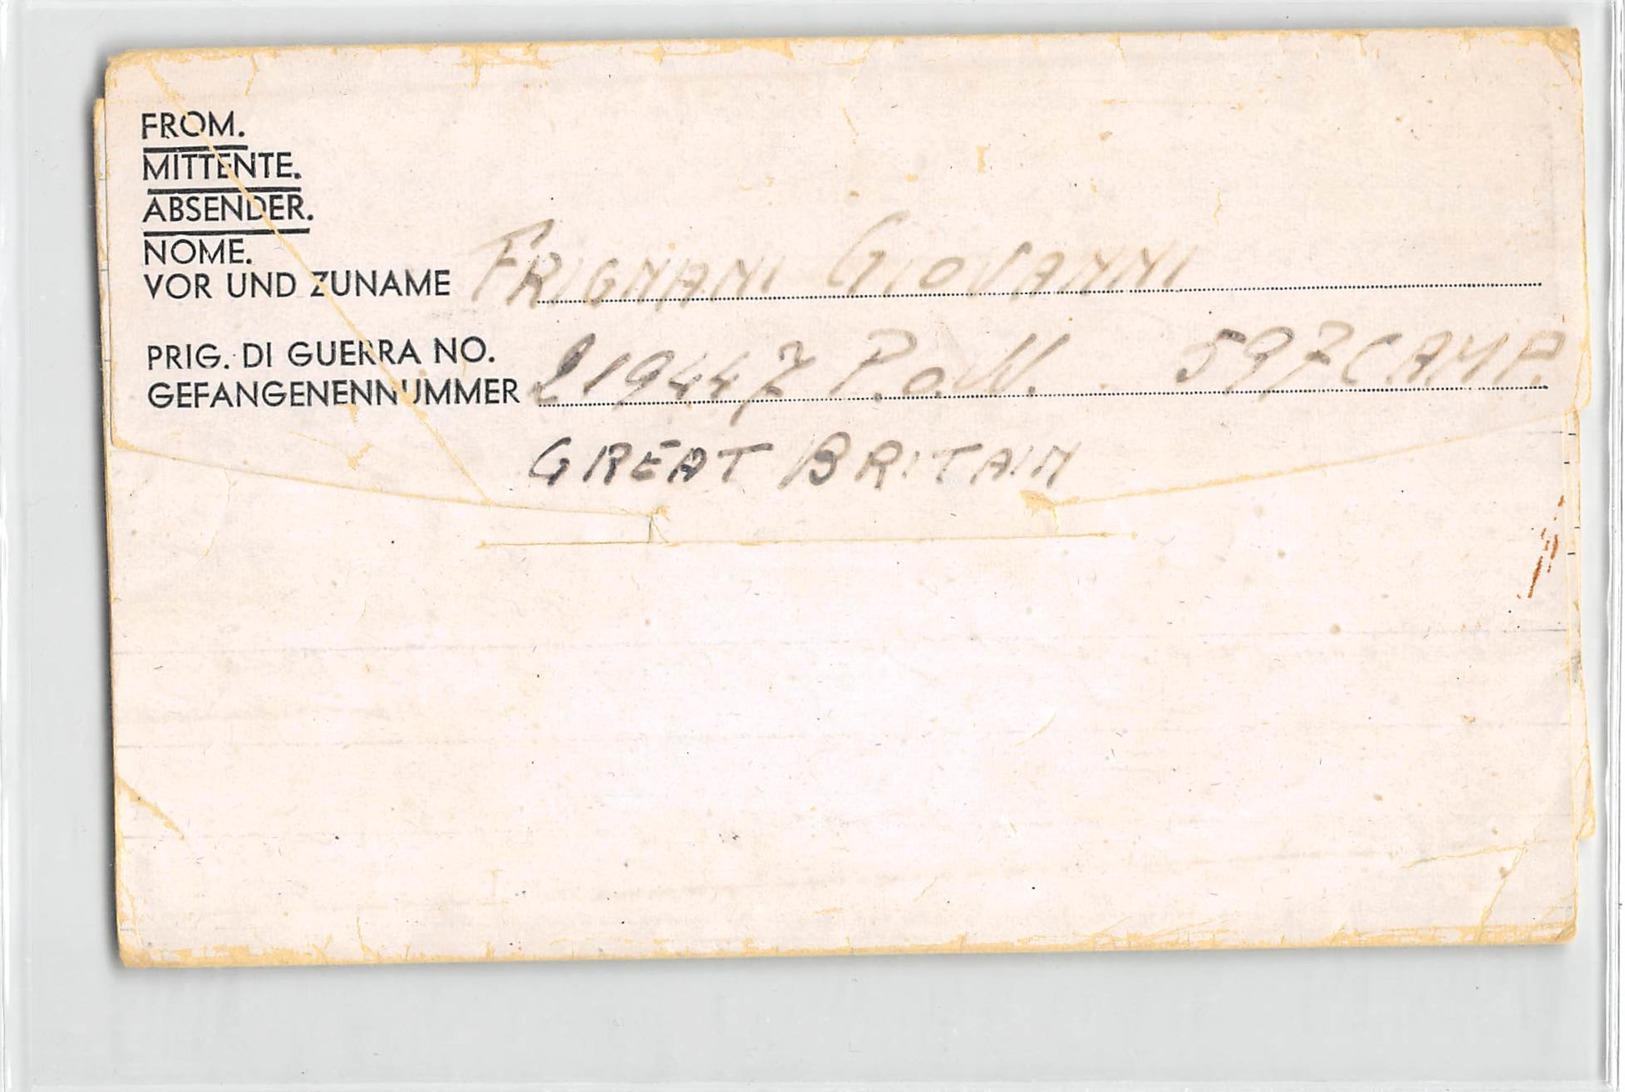 13111 ITALIAN PRISONER OF WAR POST - P.O.W. CAMP 597 GREAT BRITAIN    TO FERRARA - 1902-1951 (Rois)